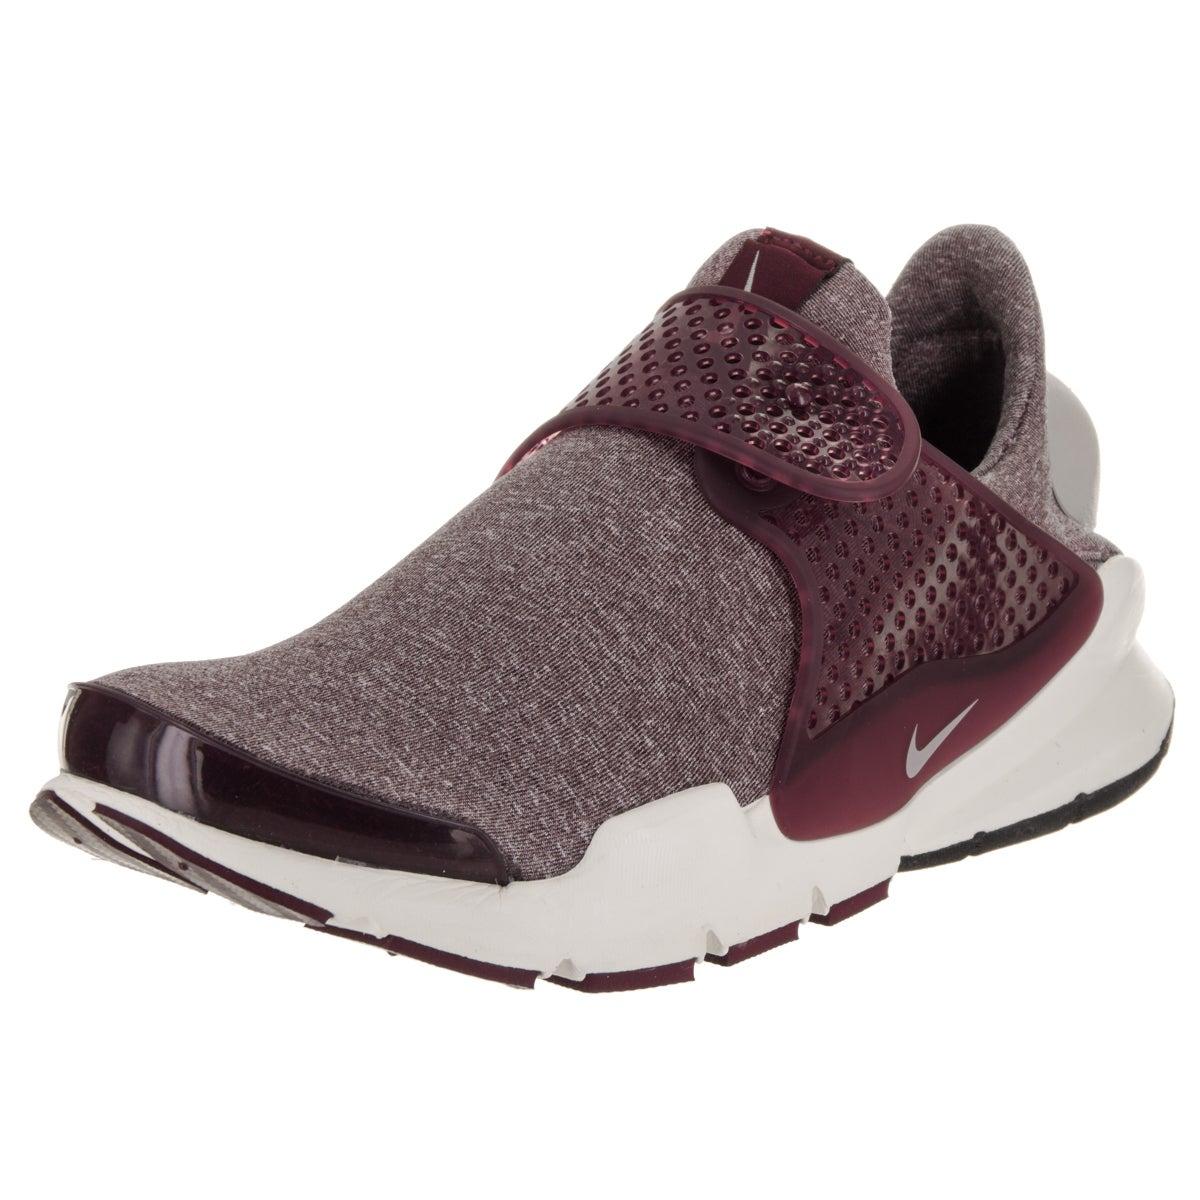 Shop Nike Women\'s Sock Dart SE Night Maroon/Iron Ore Laceless ...